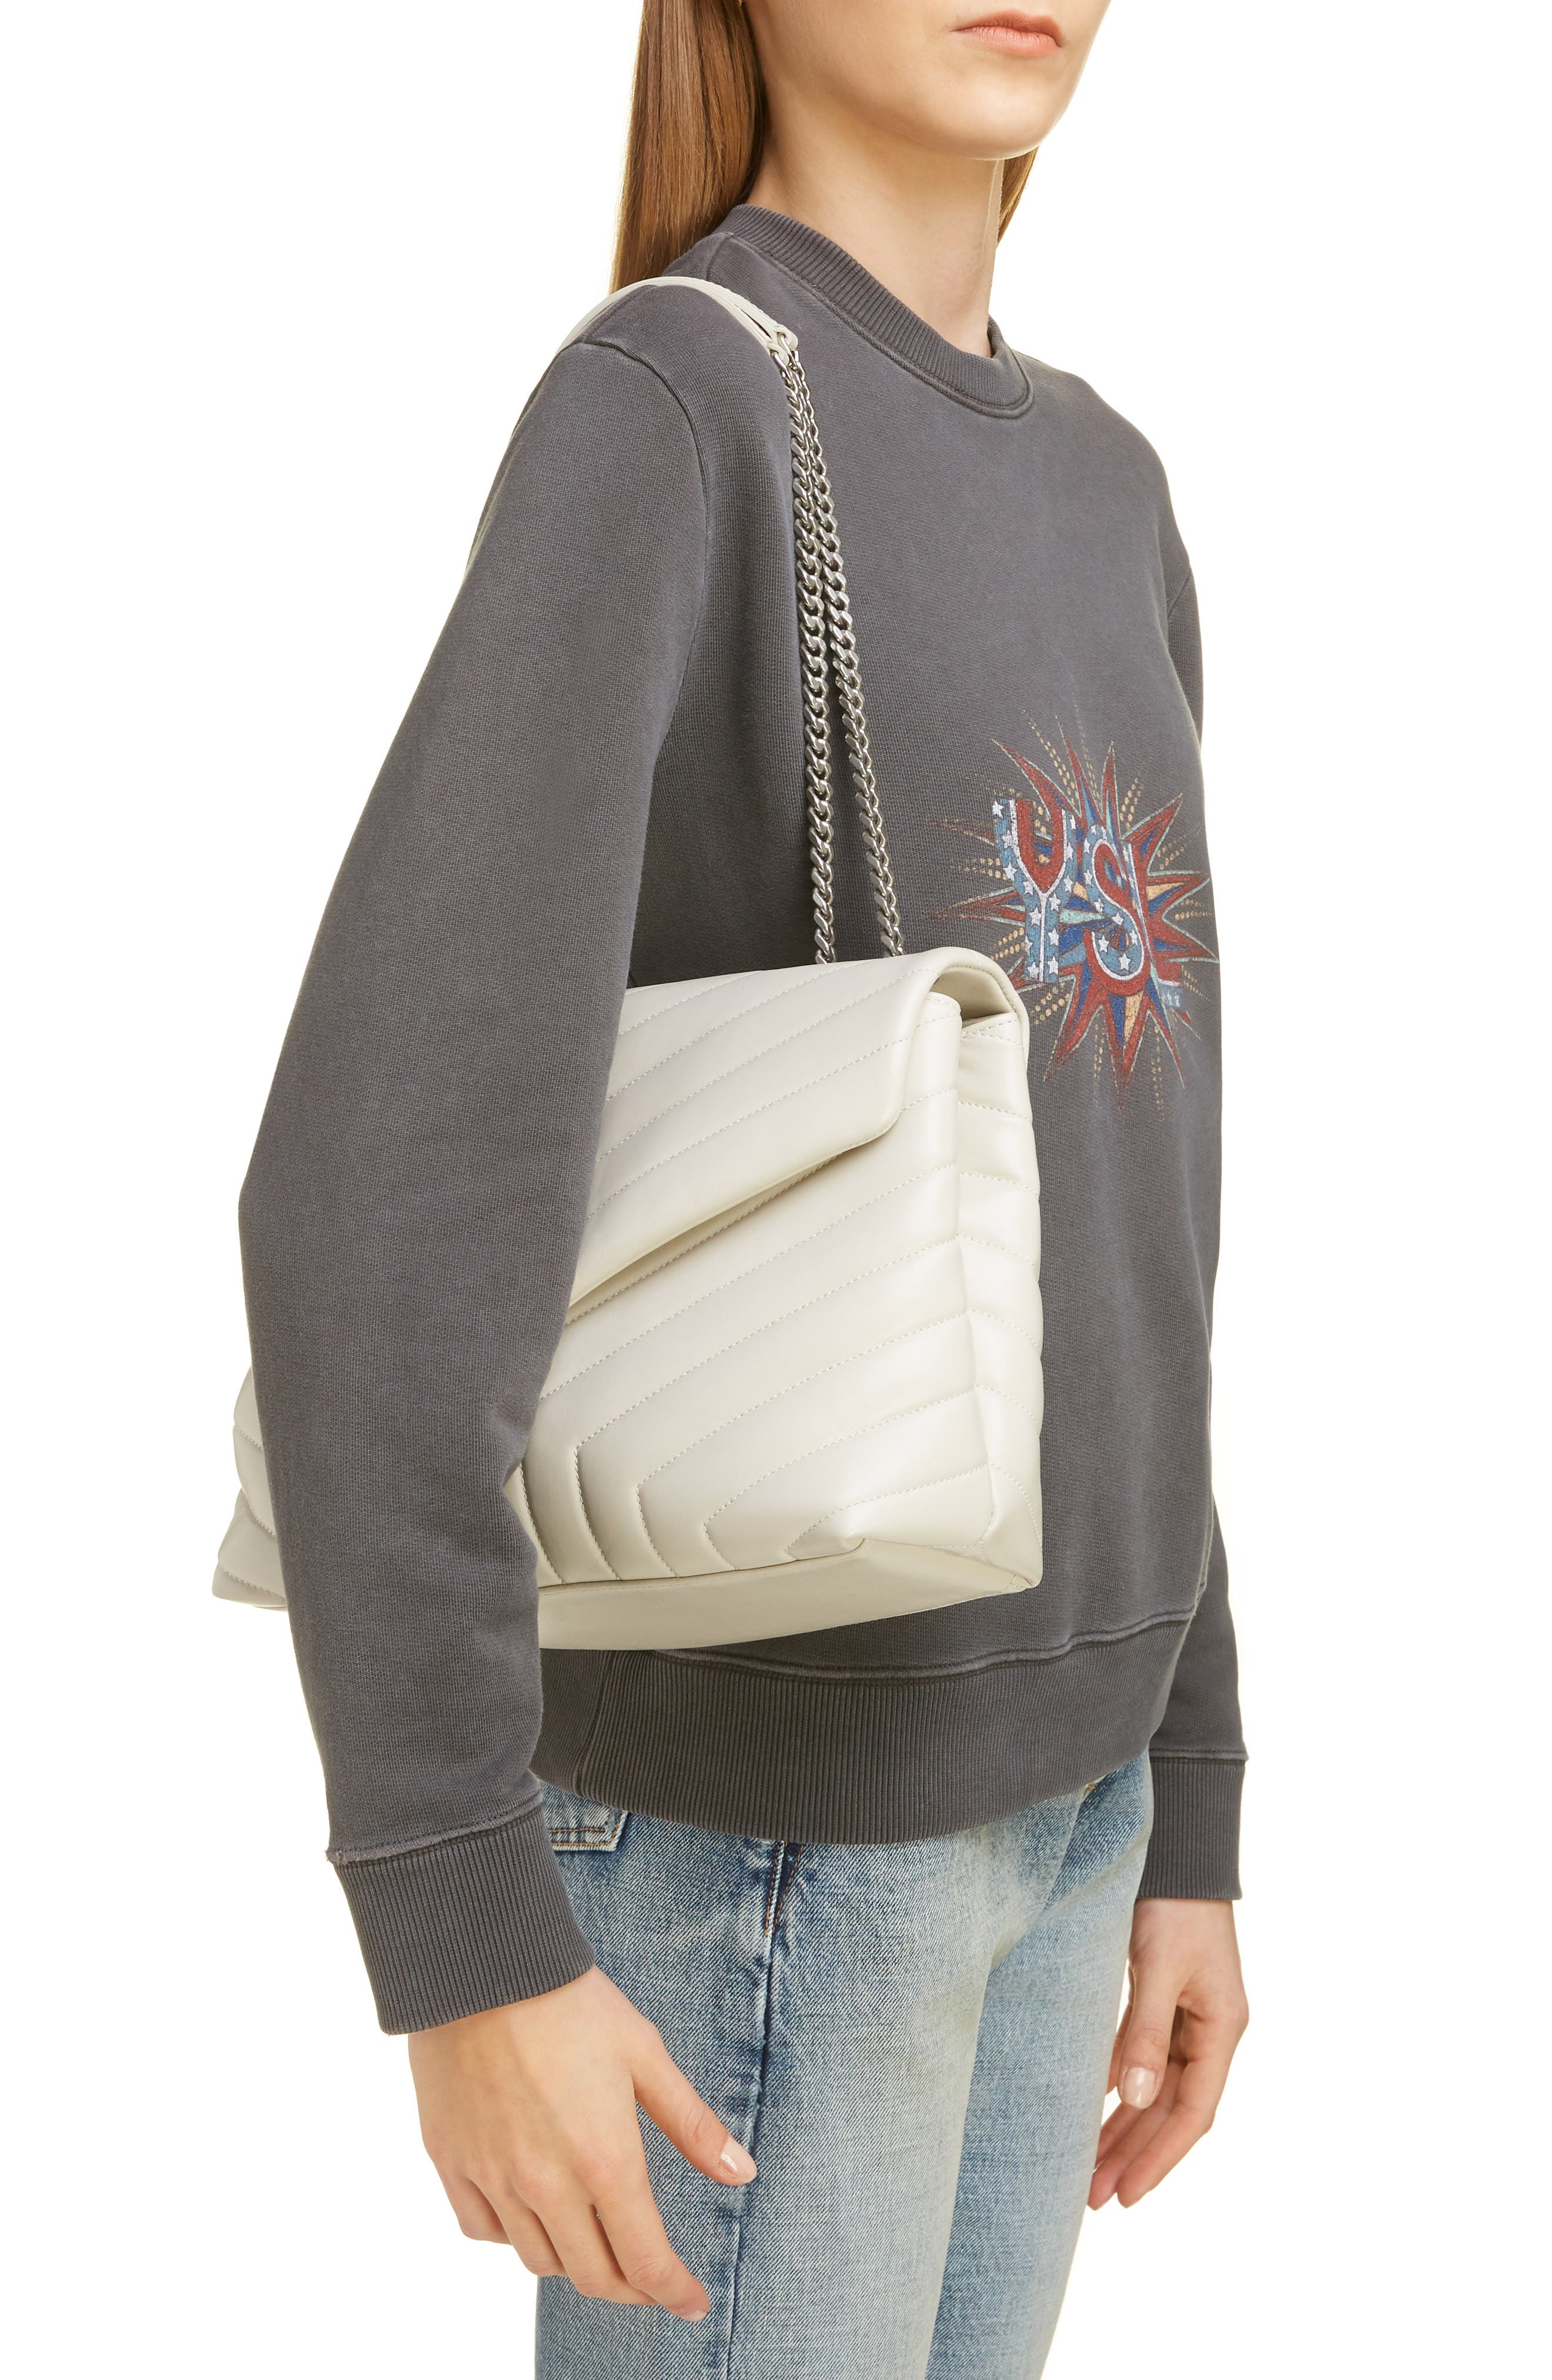 SAINT LAURENT, Medium Loulou Calfskin Leather Shoulder Bag, Alternate thumbnail 2, color, CREMA SOFT/ CREMA SOFT